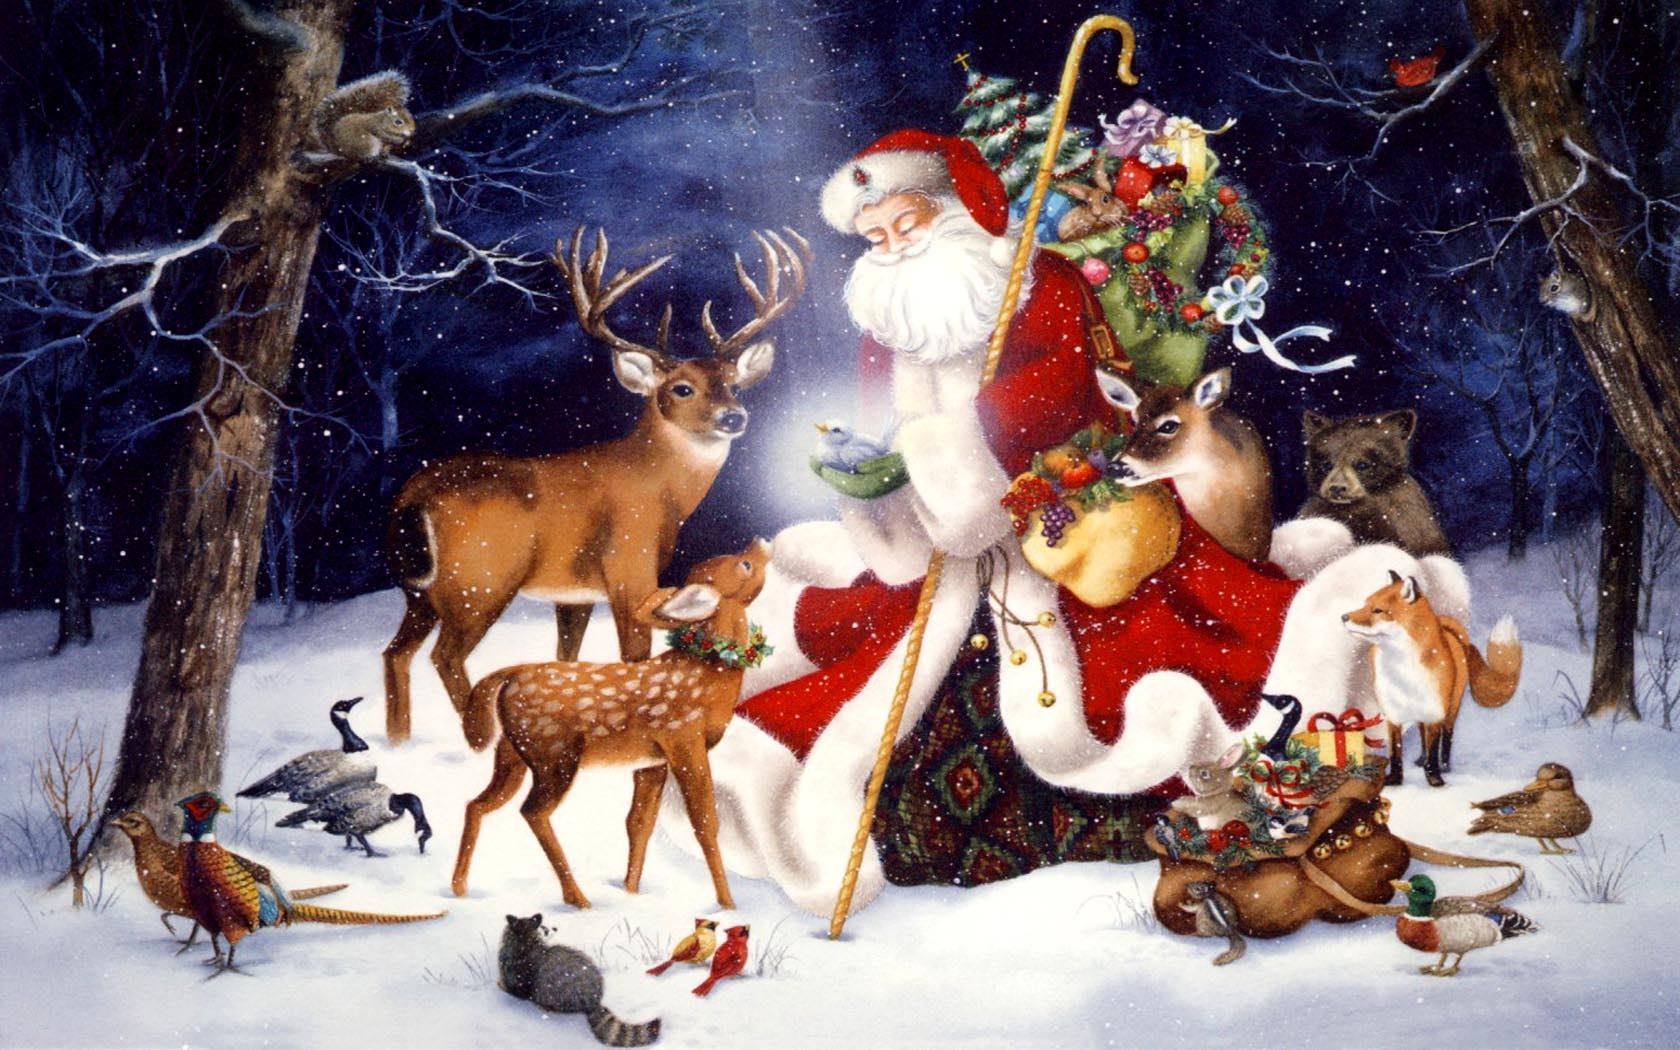 Christmas Screensavers wallpaper 1680x1050 79340 1680x1050